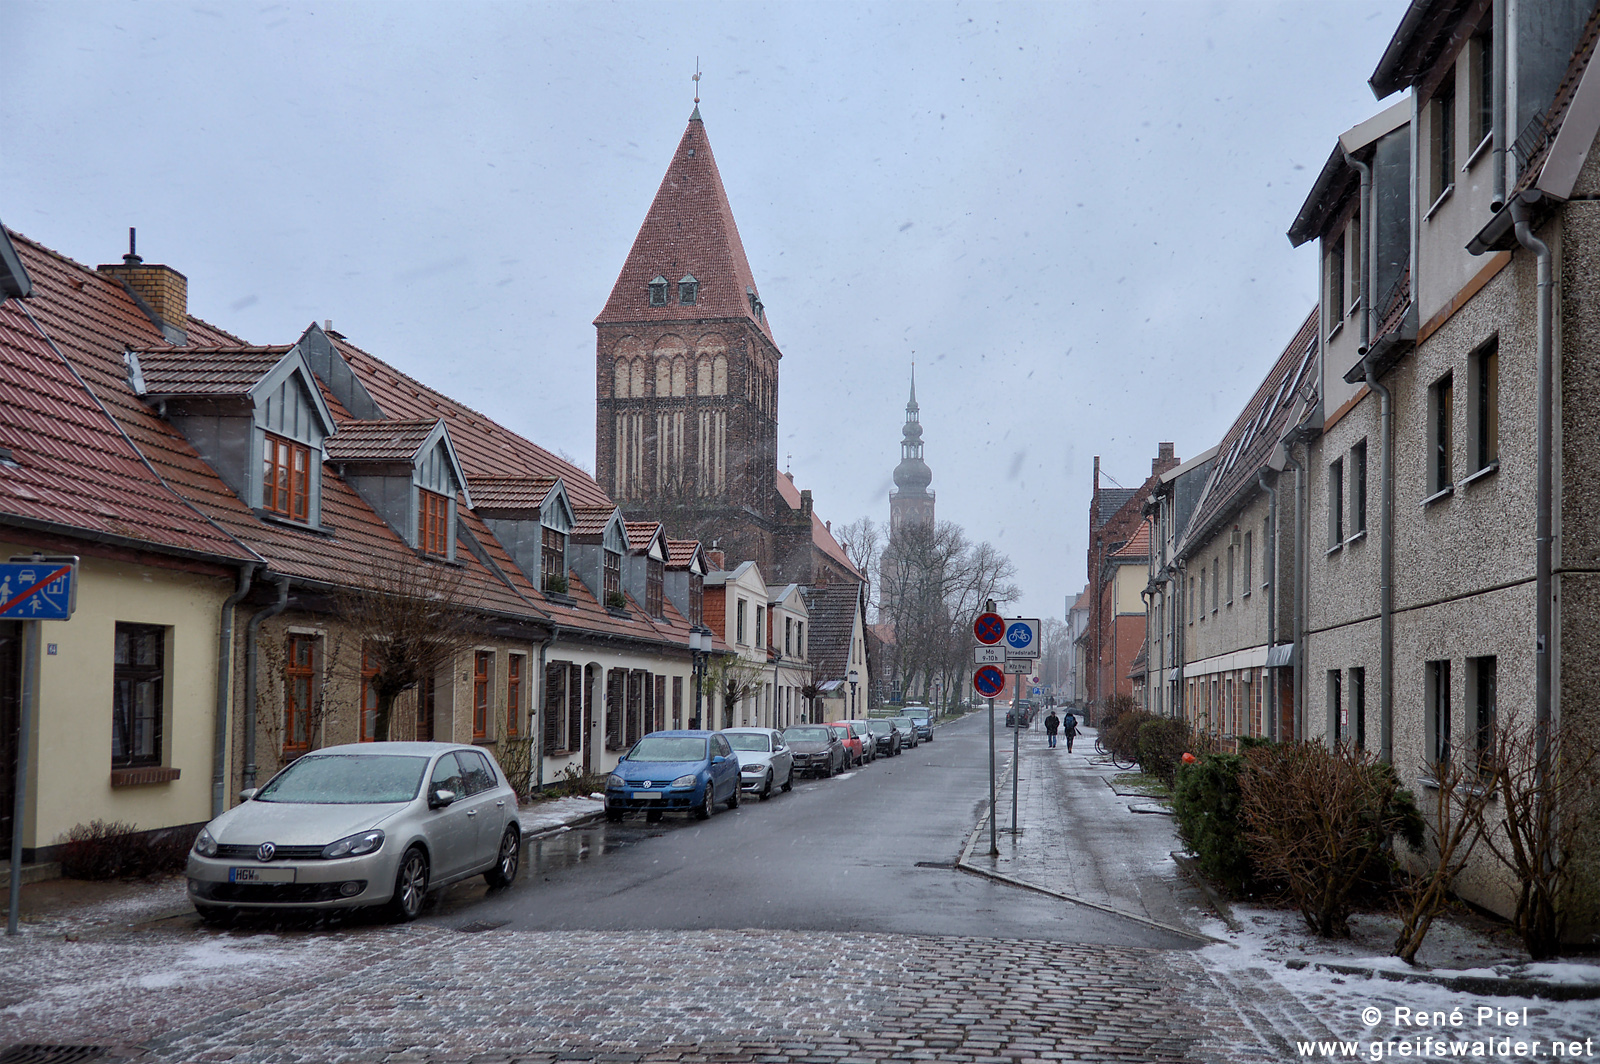 Schmuddelwetter in Greifswald